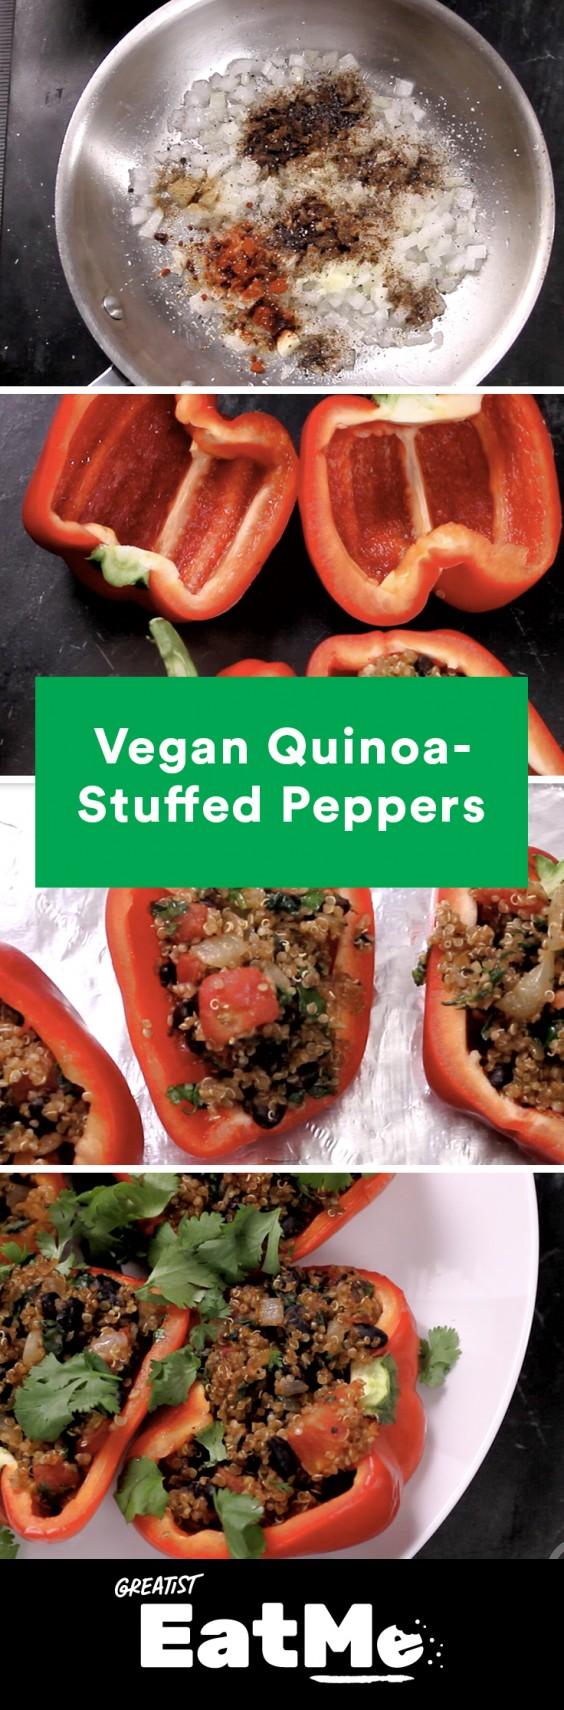 Eat Me Video: Quinoa-Stuffed Pepper